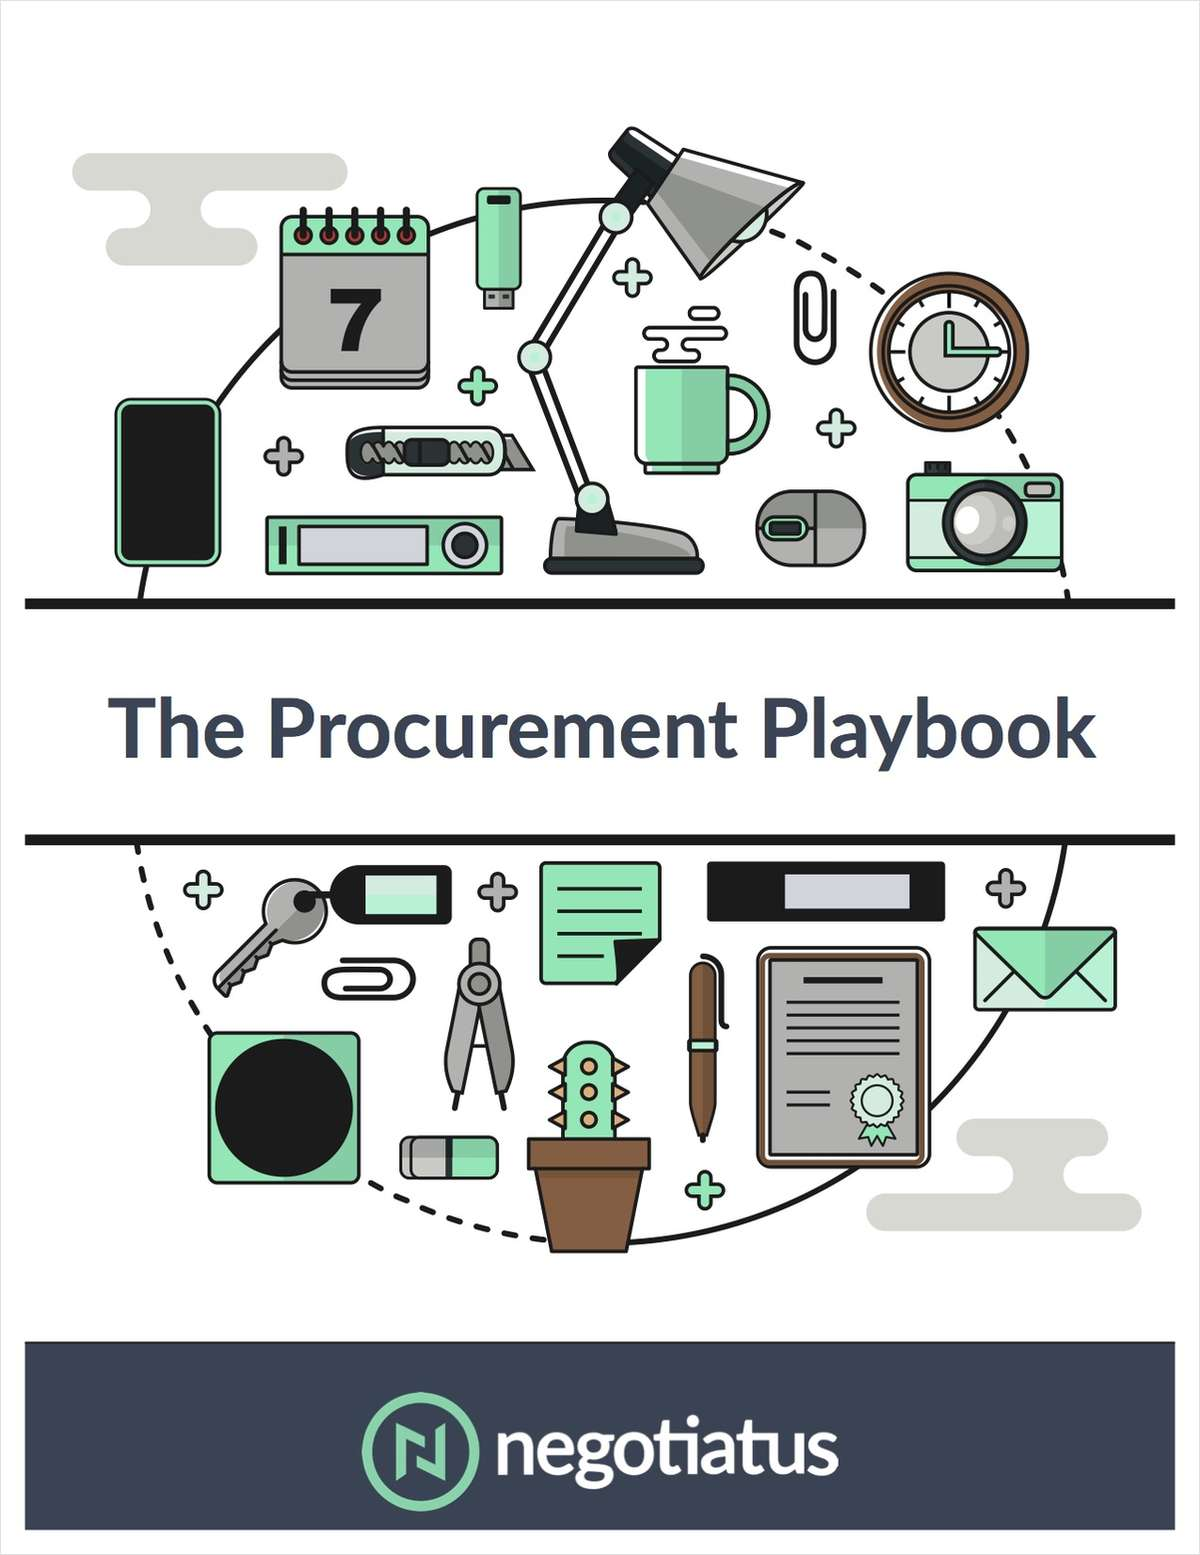 The Procurement Playbook